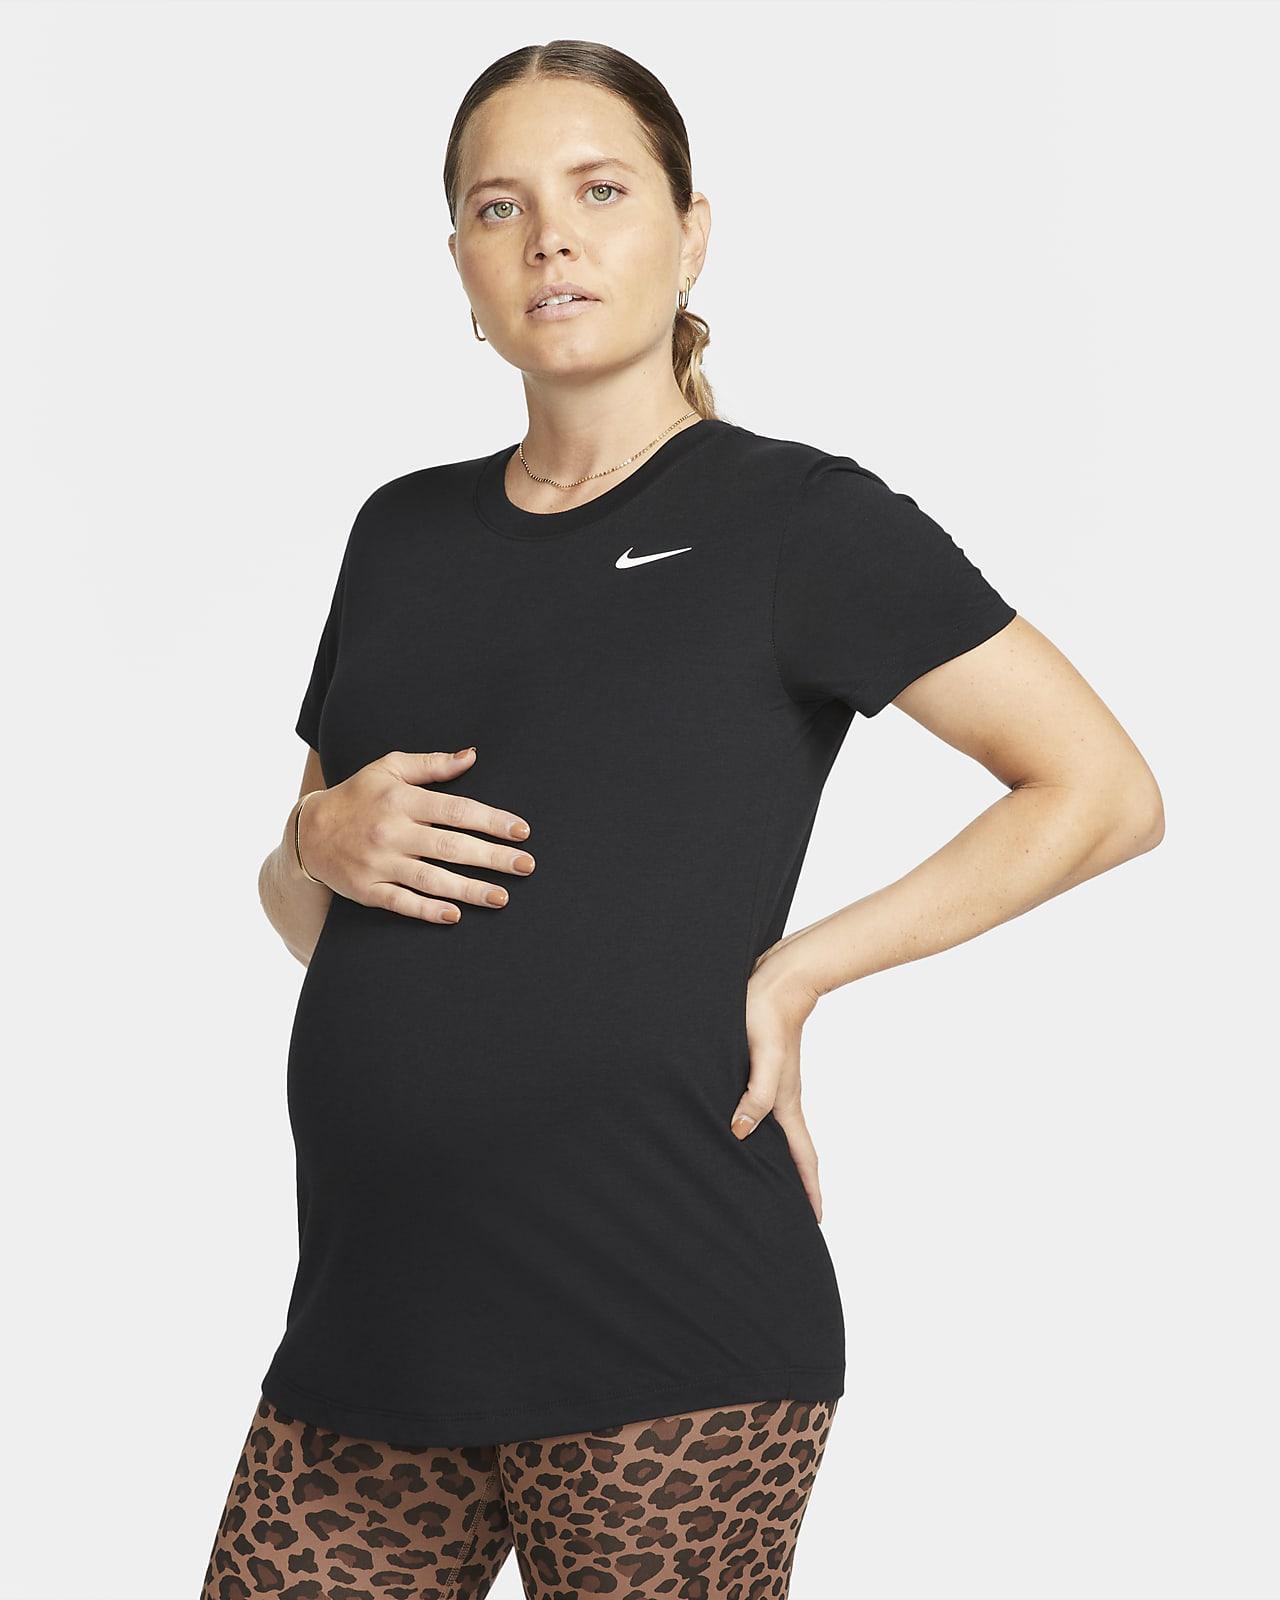 Dámské mateřské tričko Nike Dri-FIT (M)